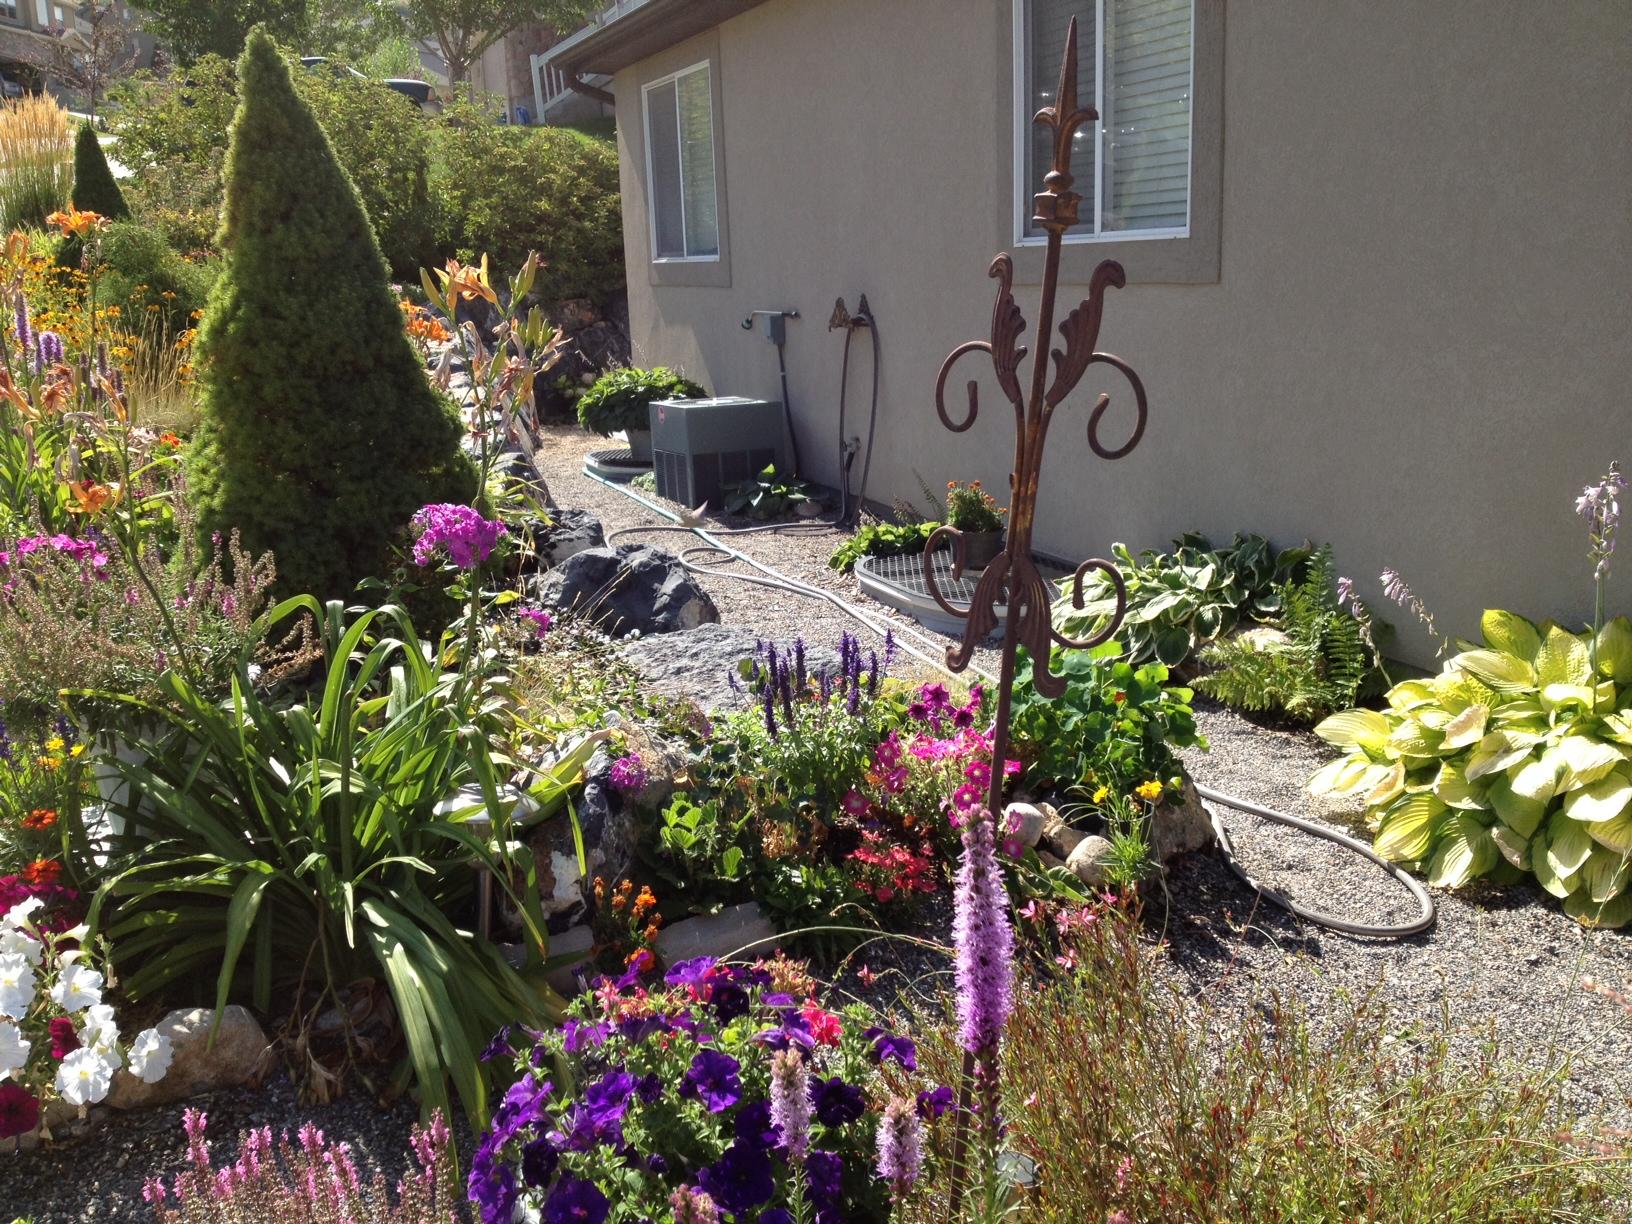 Avei residence on Sugarloaf Drive